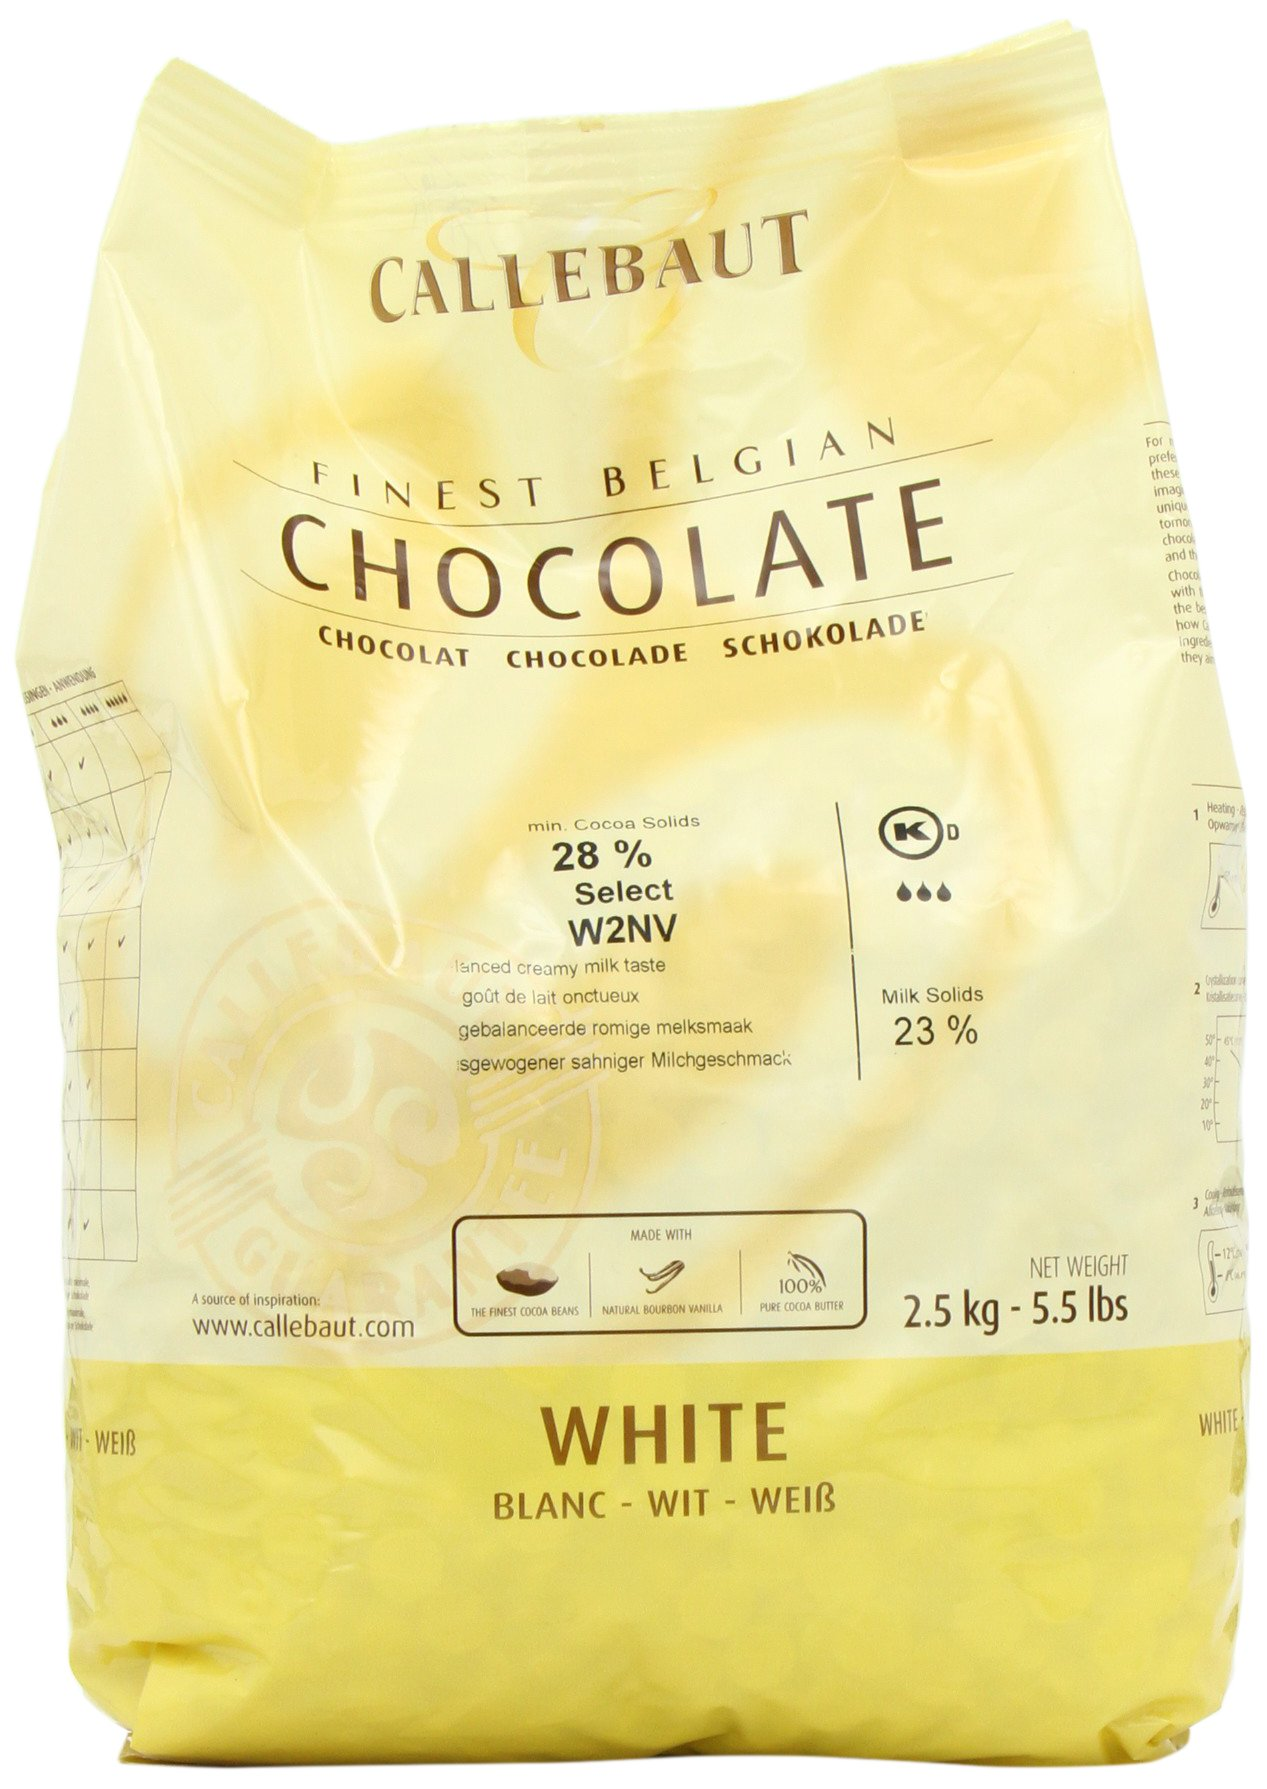 Belgian White Chocolate Baking Callets (Chips) - 1 bag, 5.5 lbs